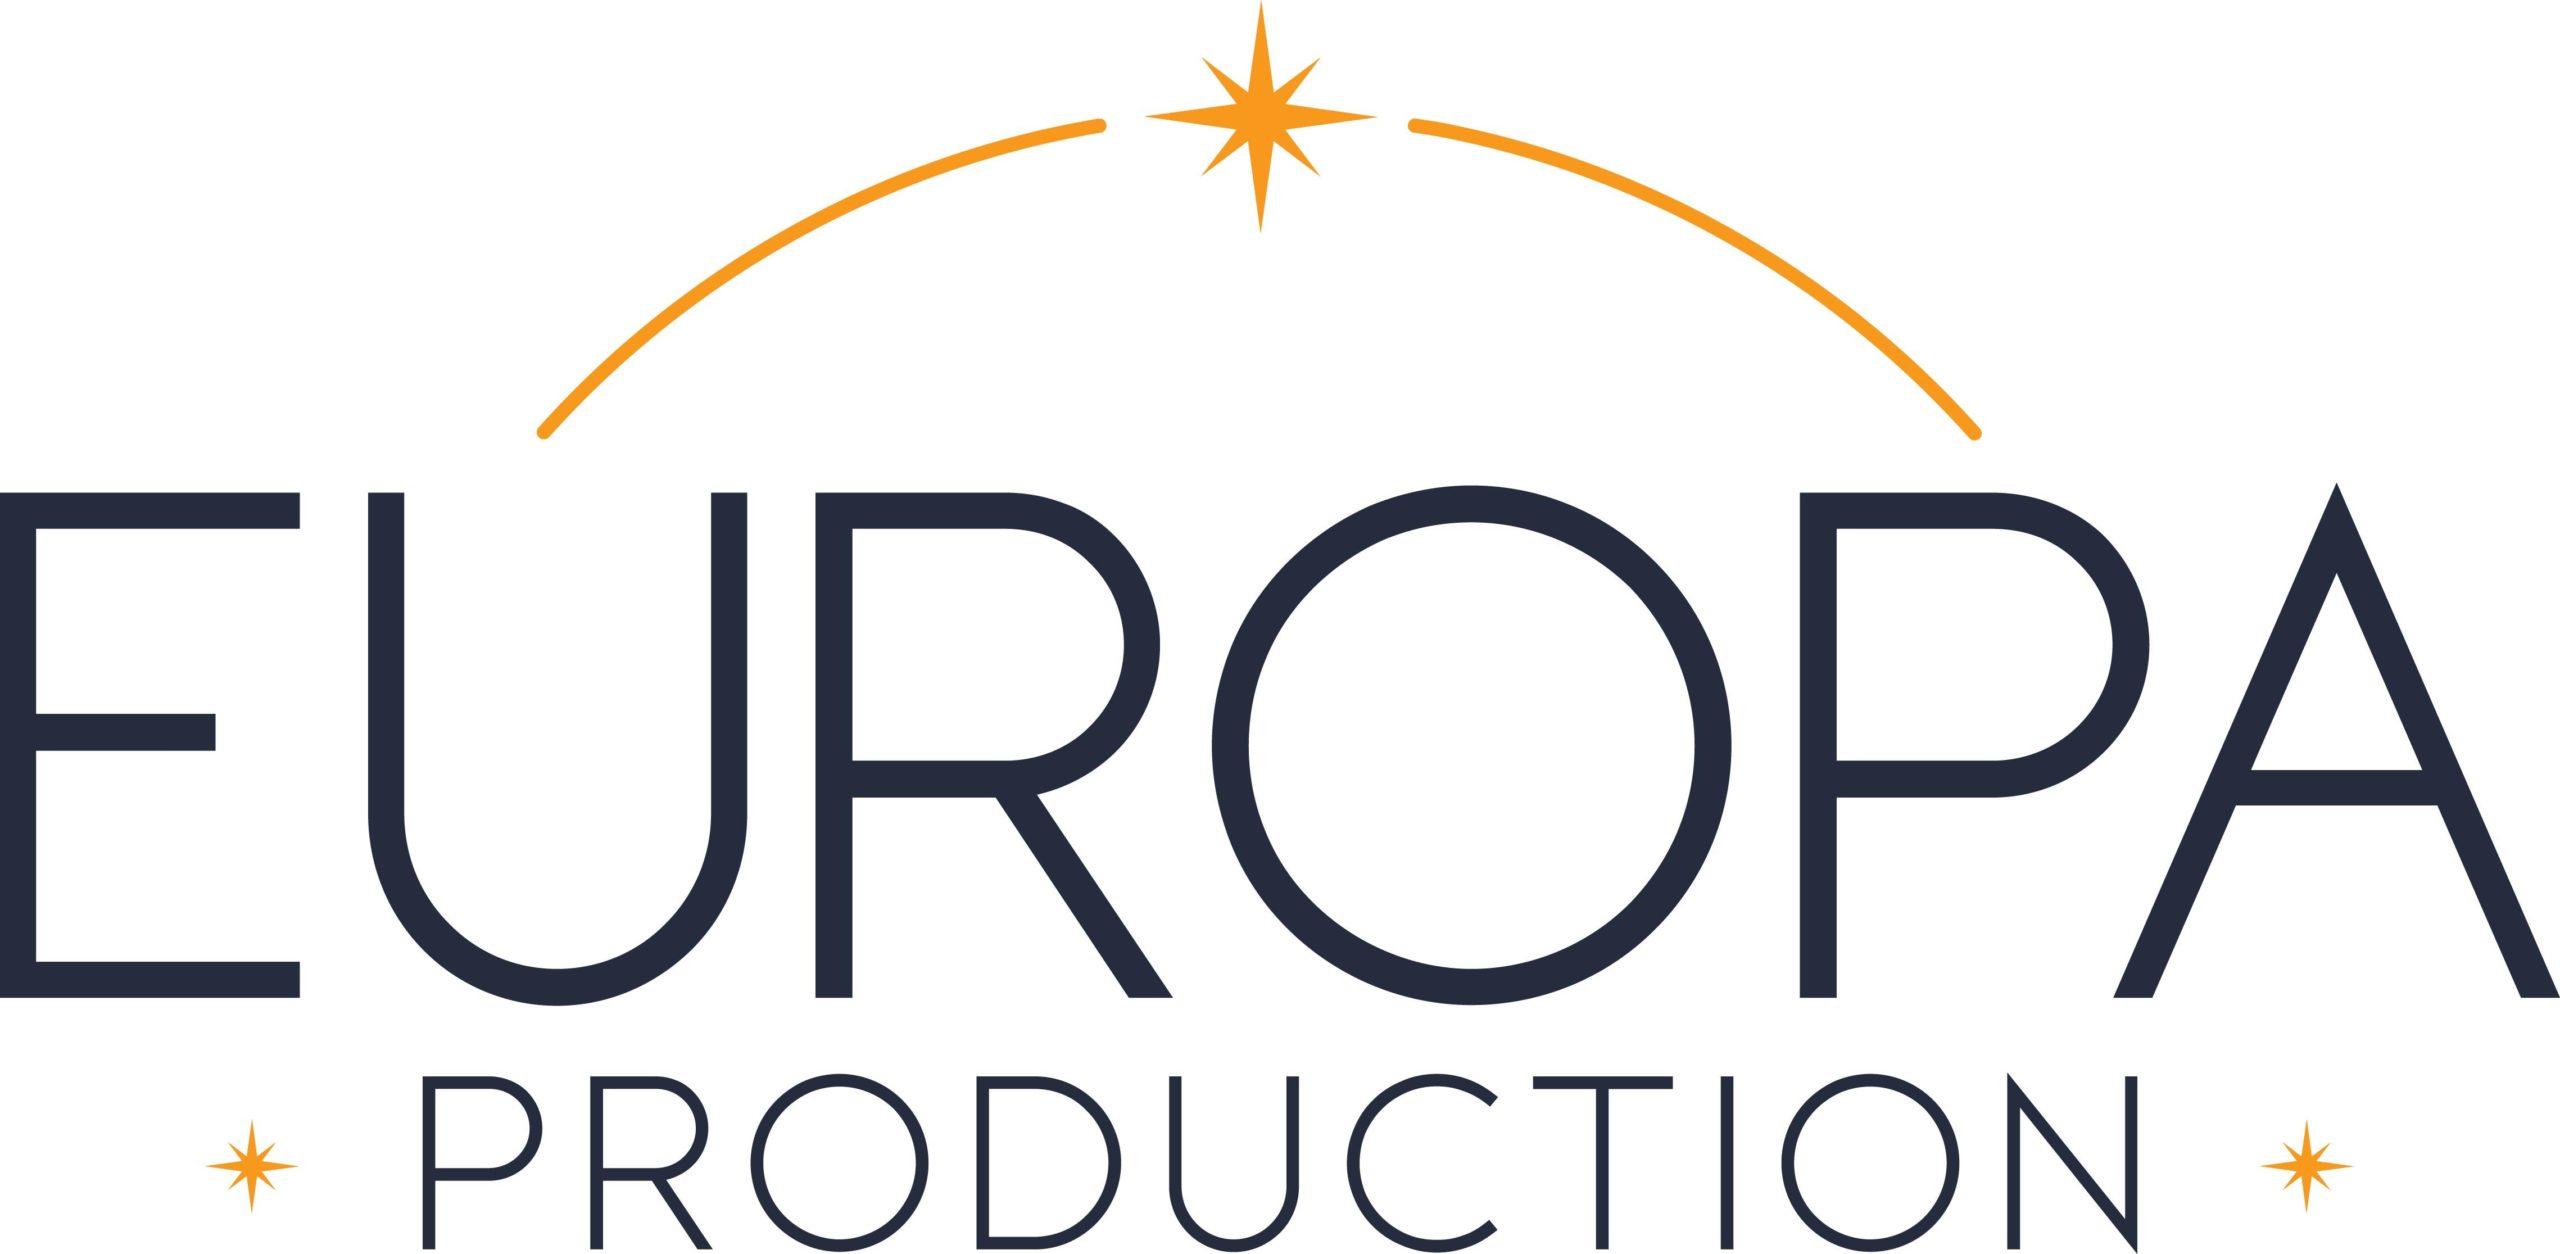 EUROPA PRODUCTION